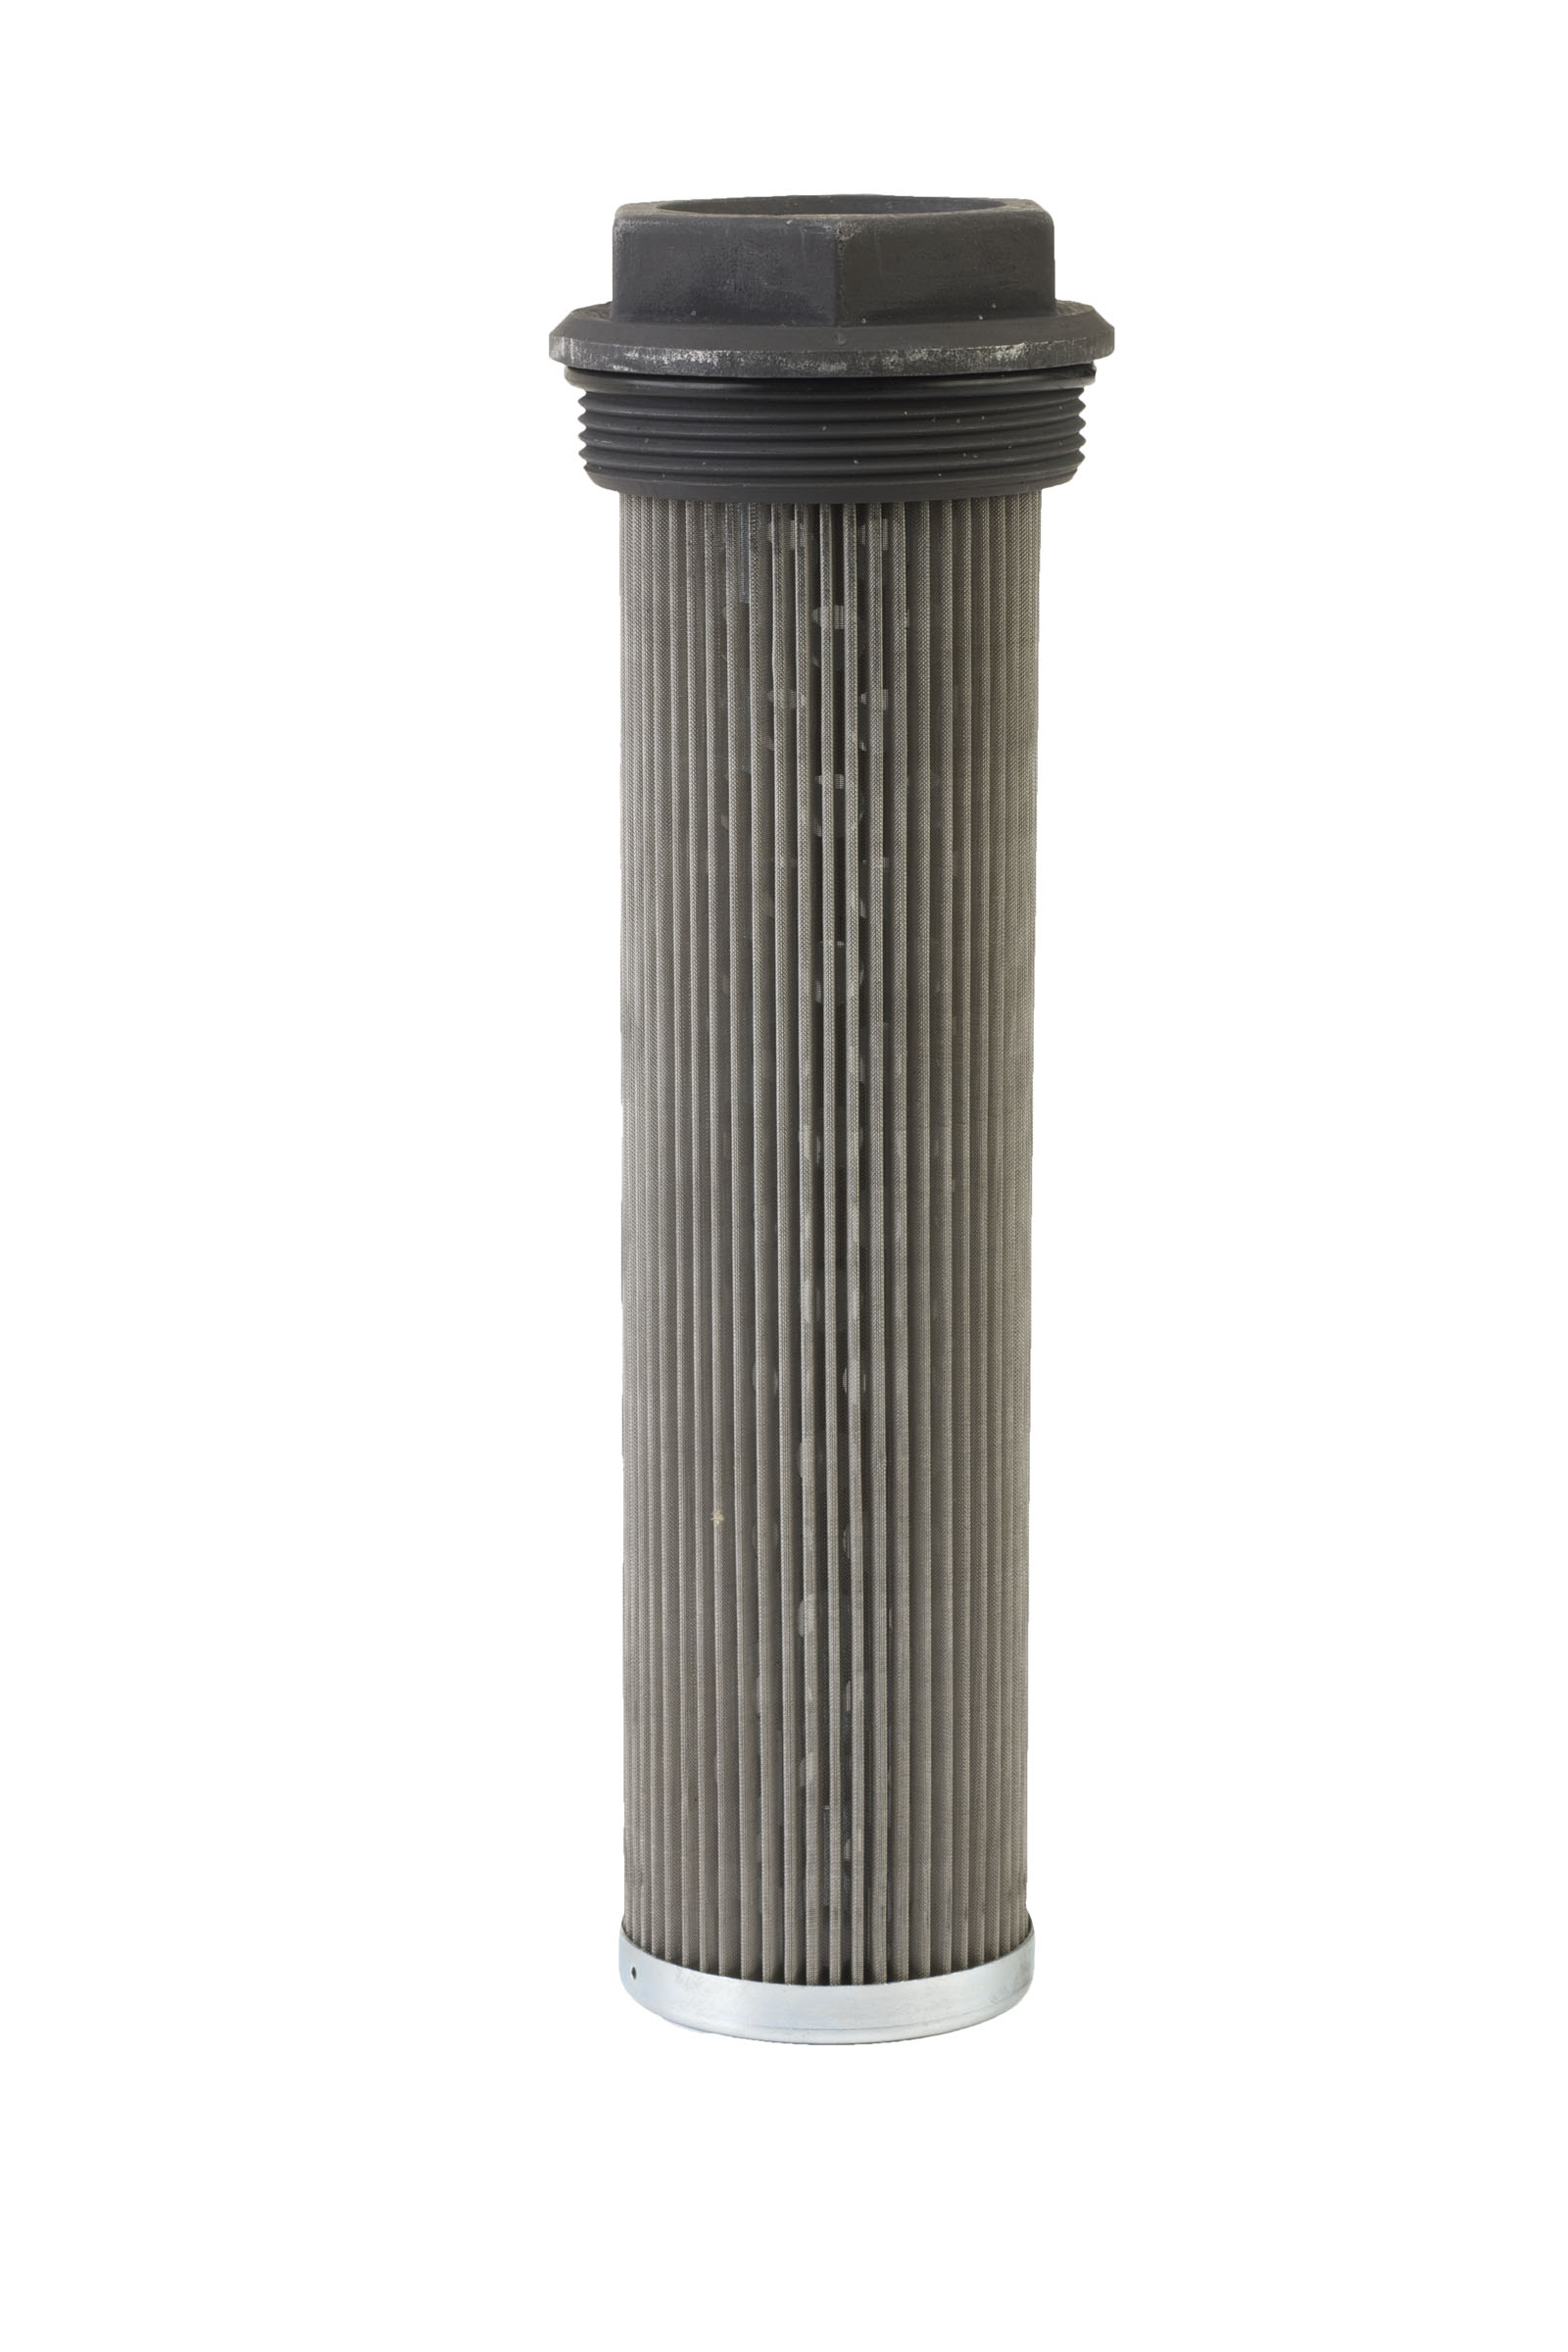 Gardner-Denver 2010509 Compatible Air Filter Element by Millennium-Filters